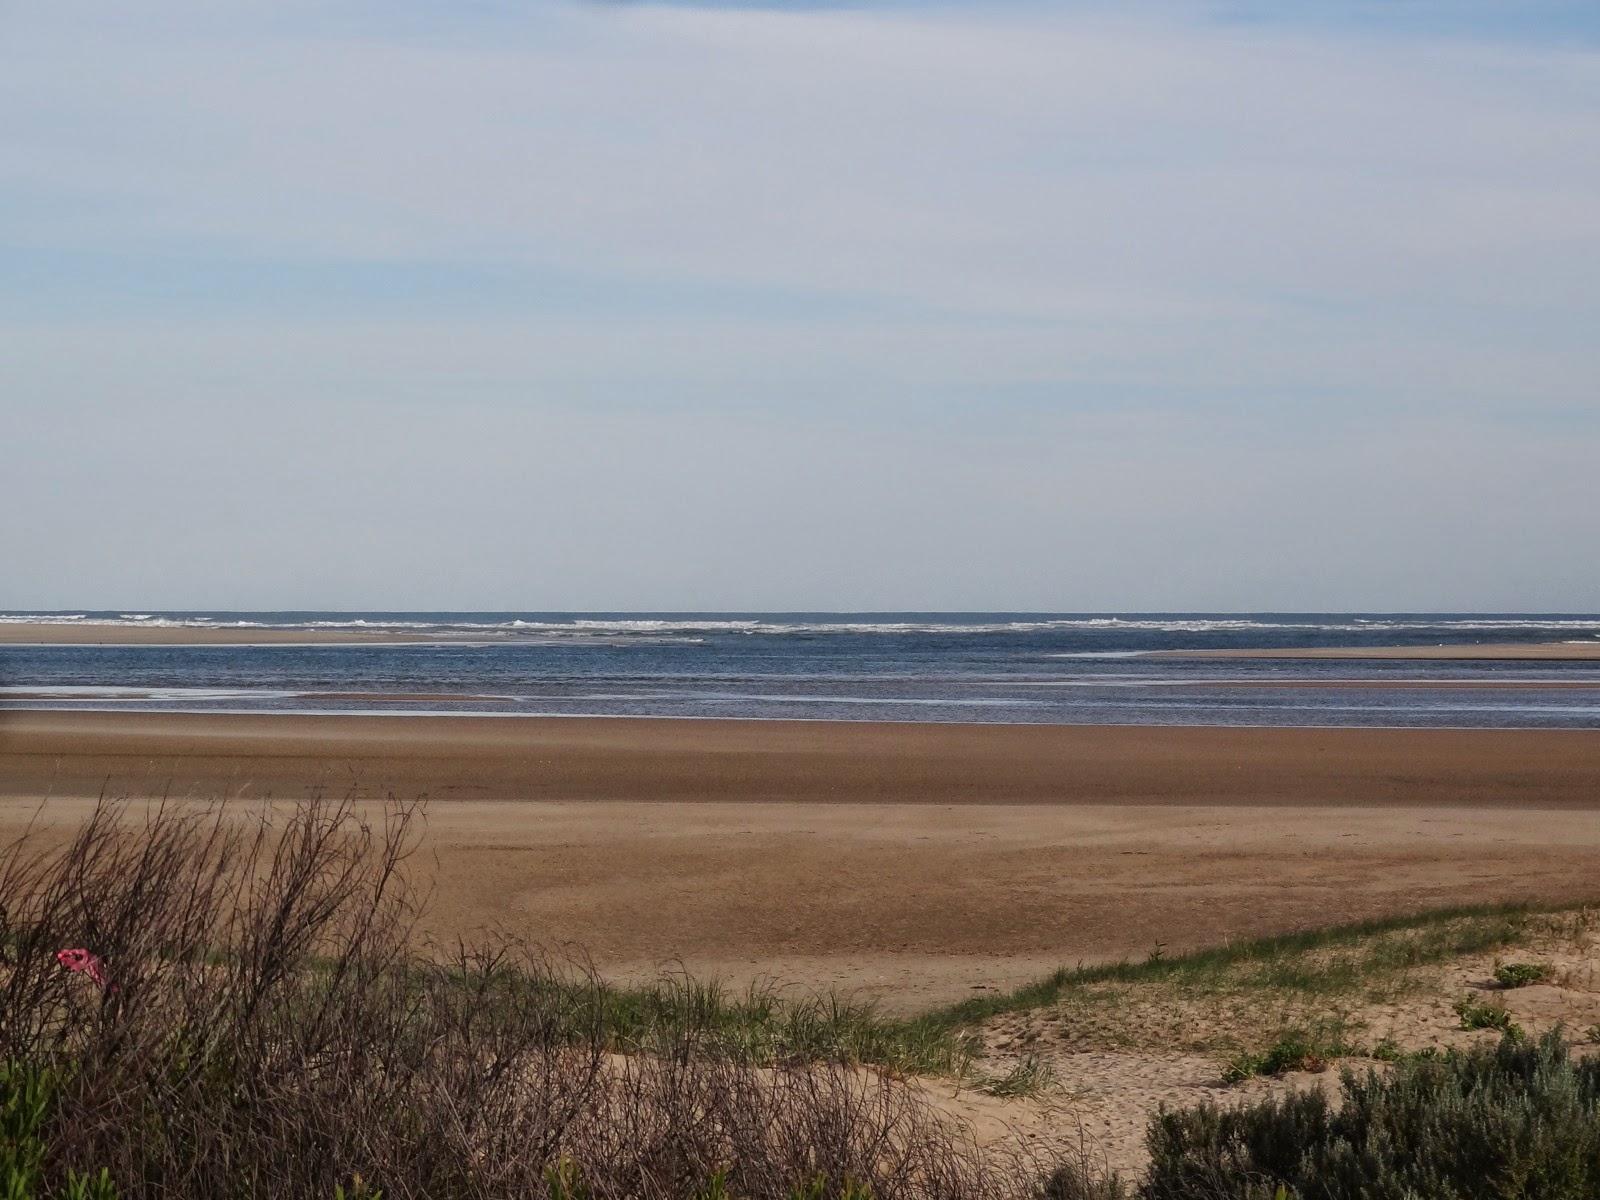 Where the Murray meets the sea from Hindmarsh Island